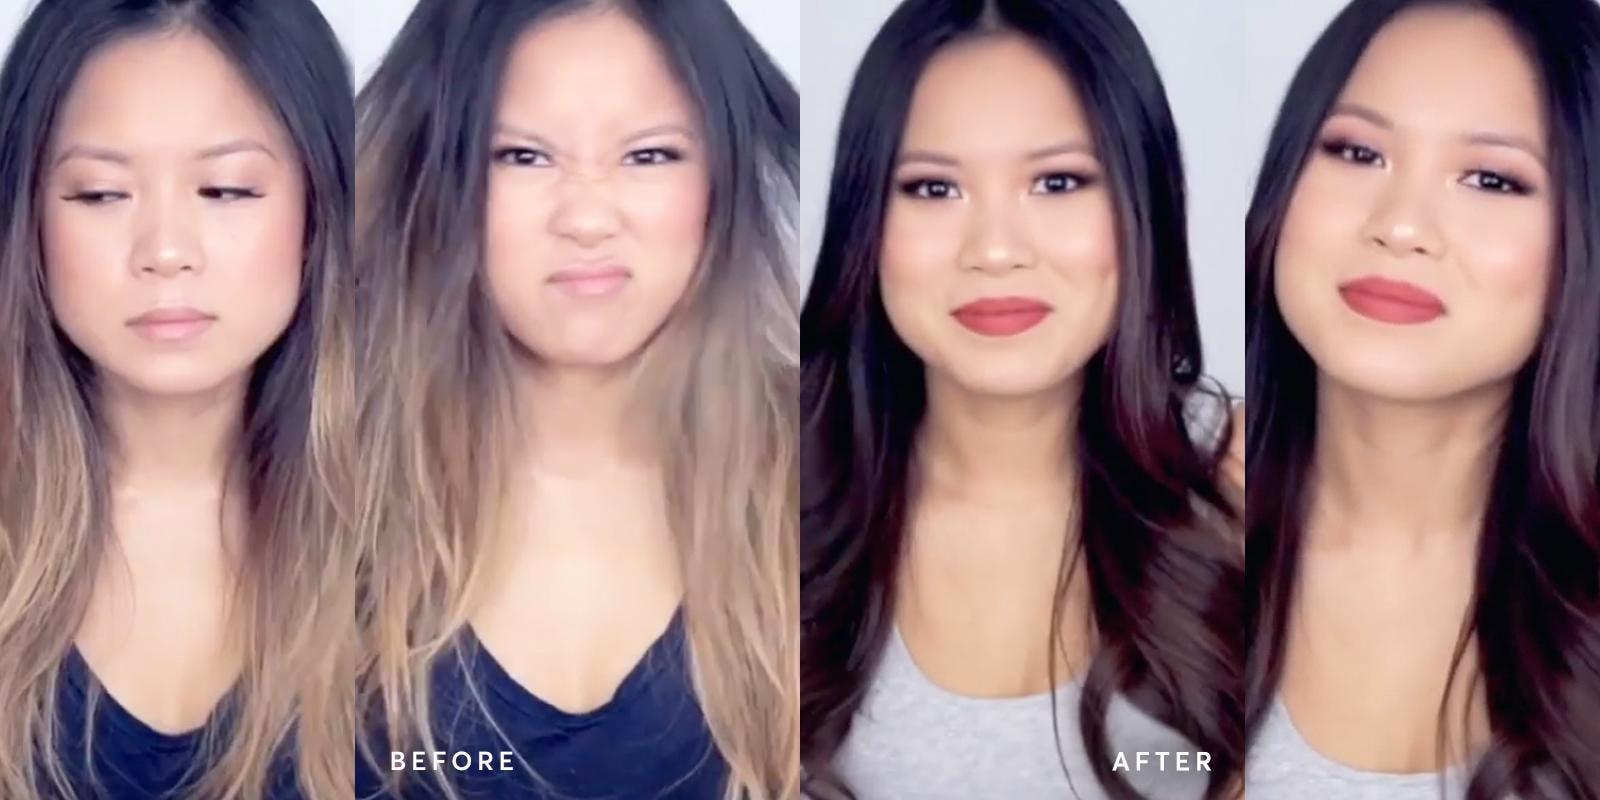 Instagram and YouTube beauty vlogger, Loan Pham